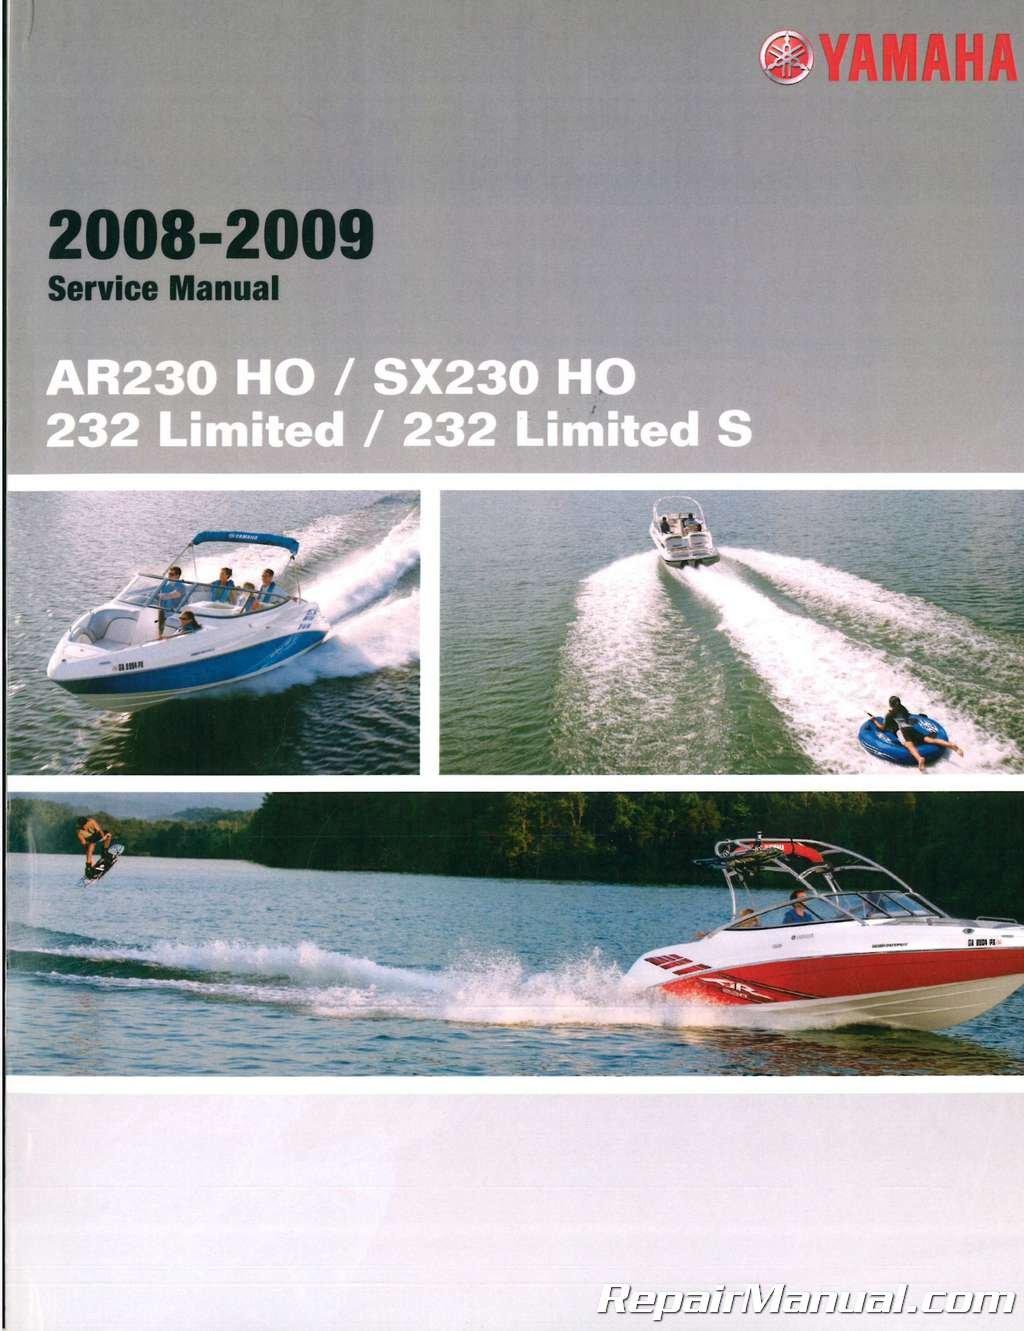 LIT-18616-SX-A2 2008-2009 Yamaha AR230 SX230 HO Limited SXT1100A-G Sport Boat  Service Manual: Manufacturer: Amazon.com: Books